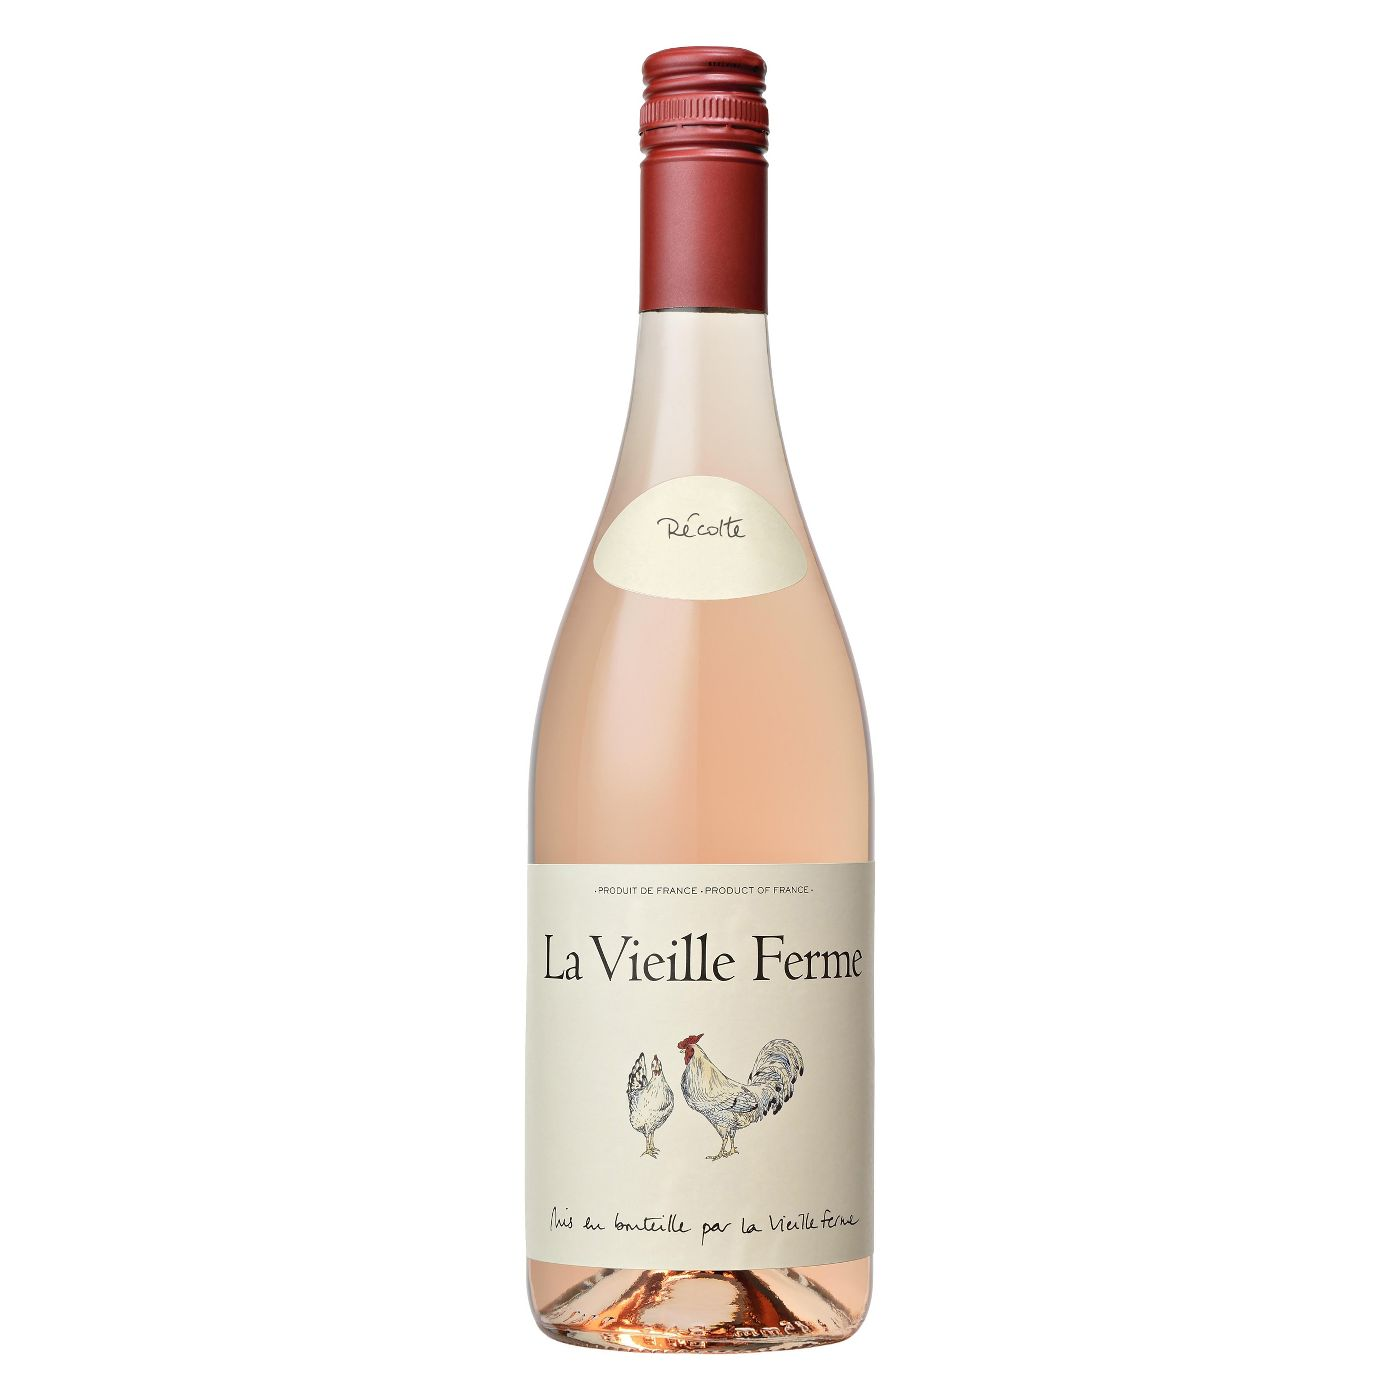 La Vielle Ferme Ros Wine - 750ml Bottle - image 1 of 1